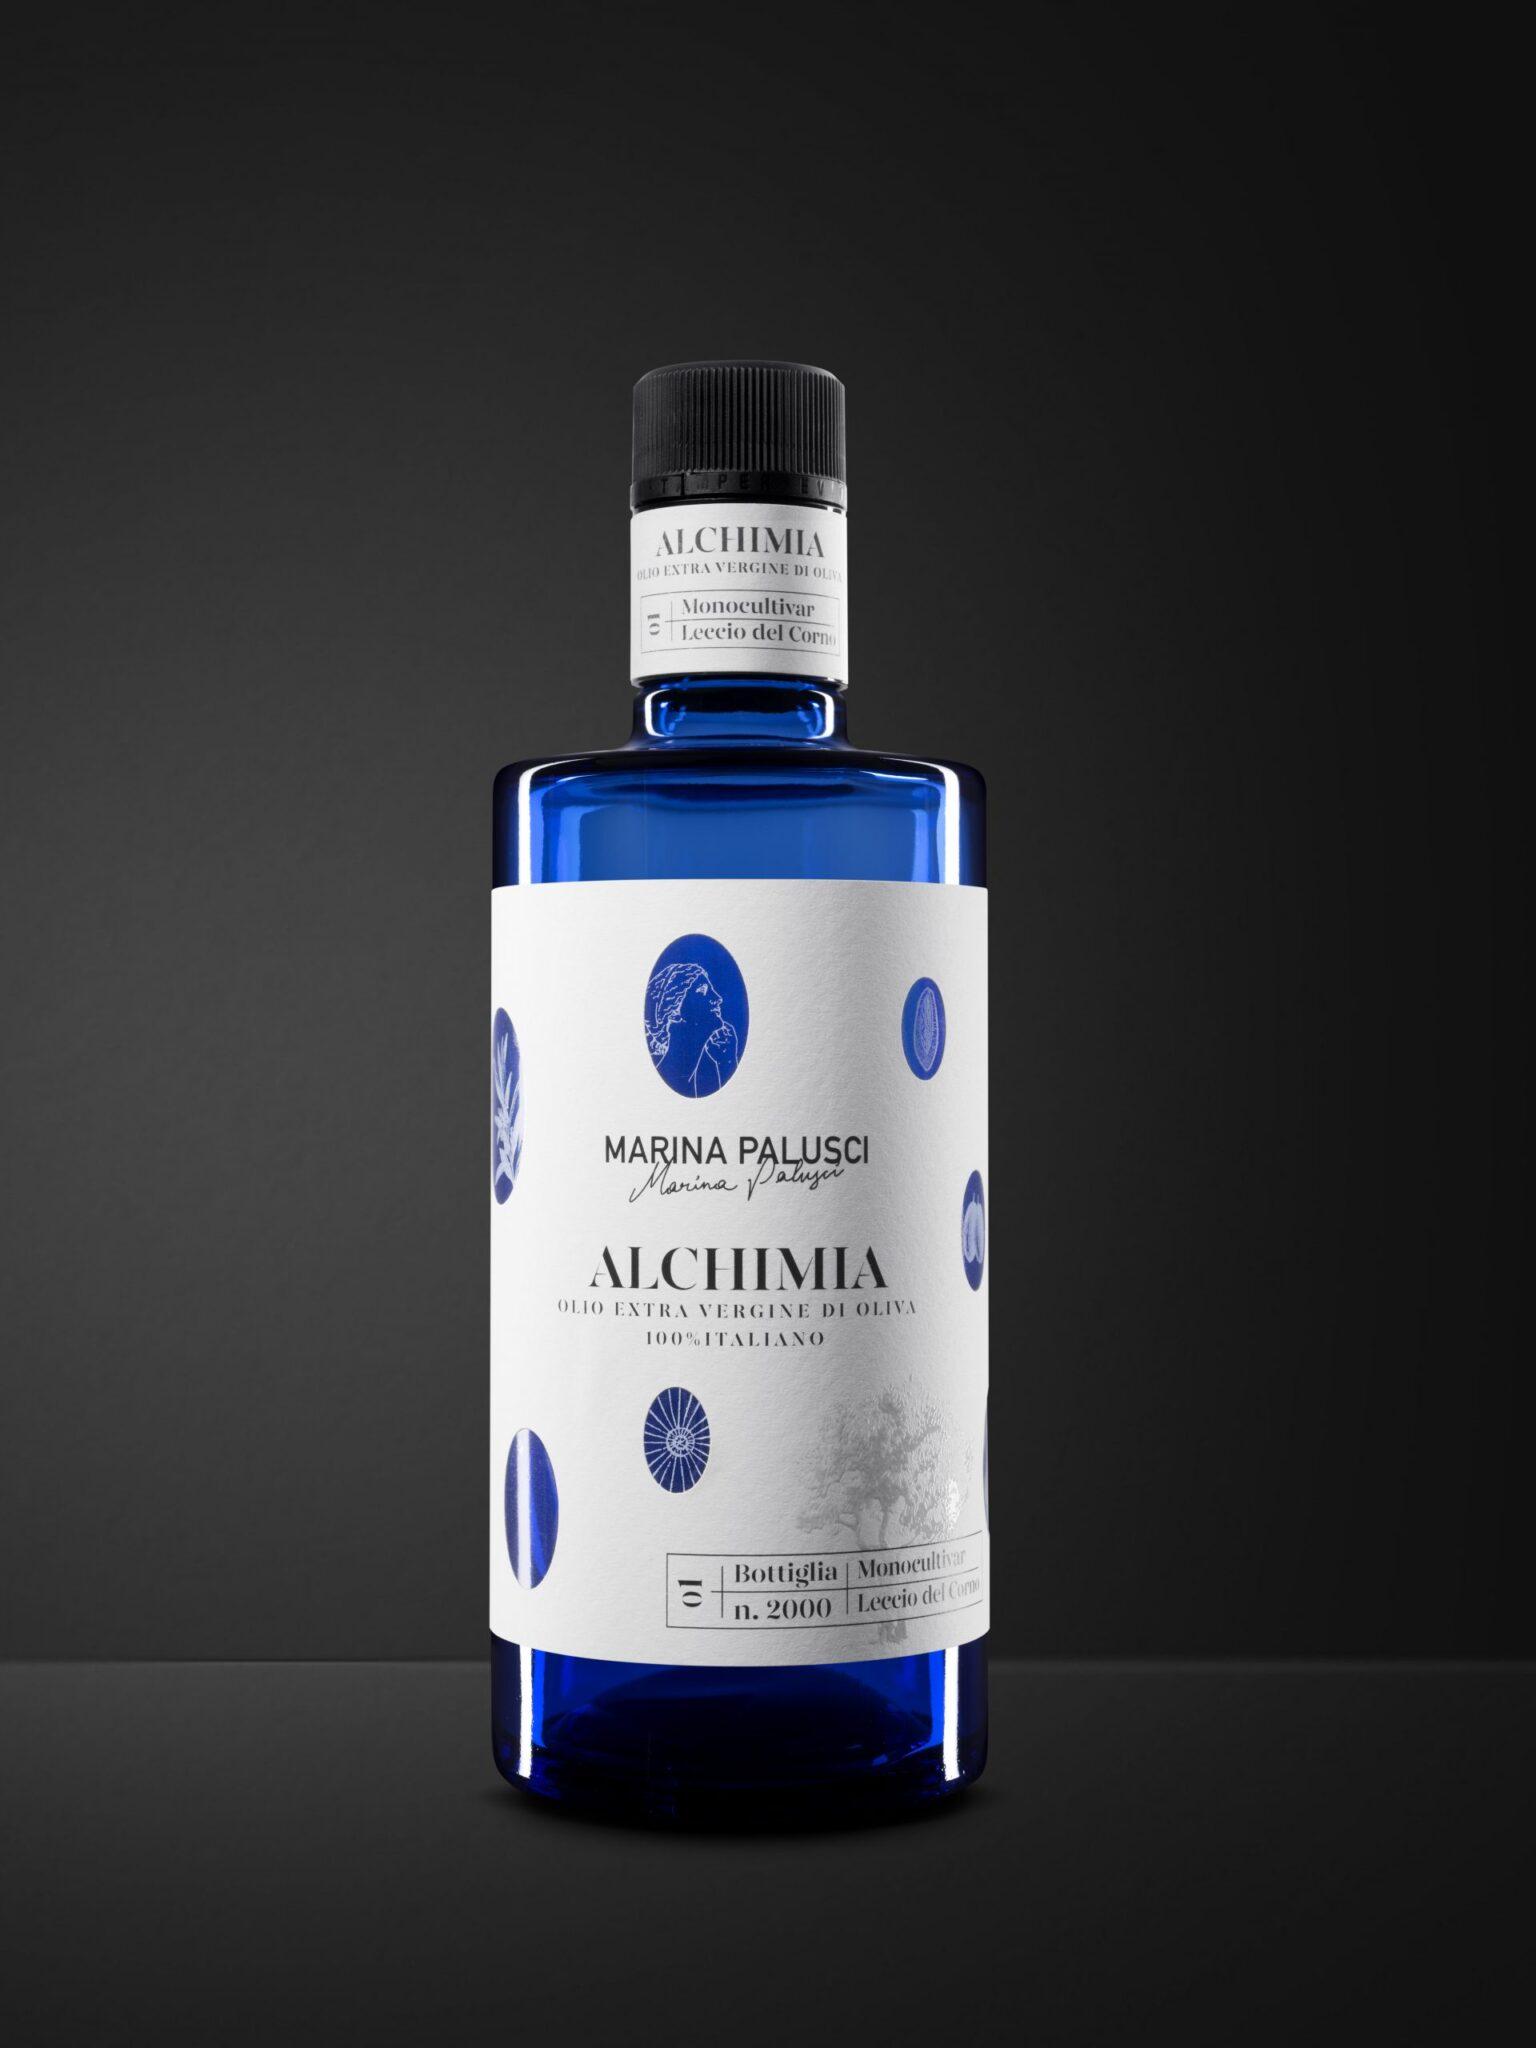 Alchimia Marina Palusci